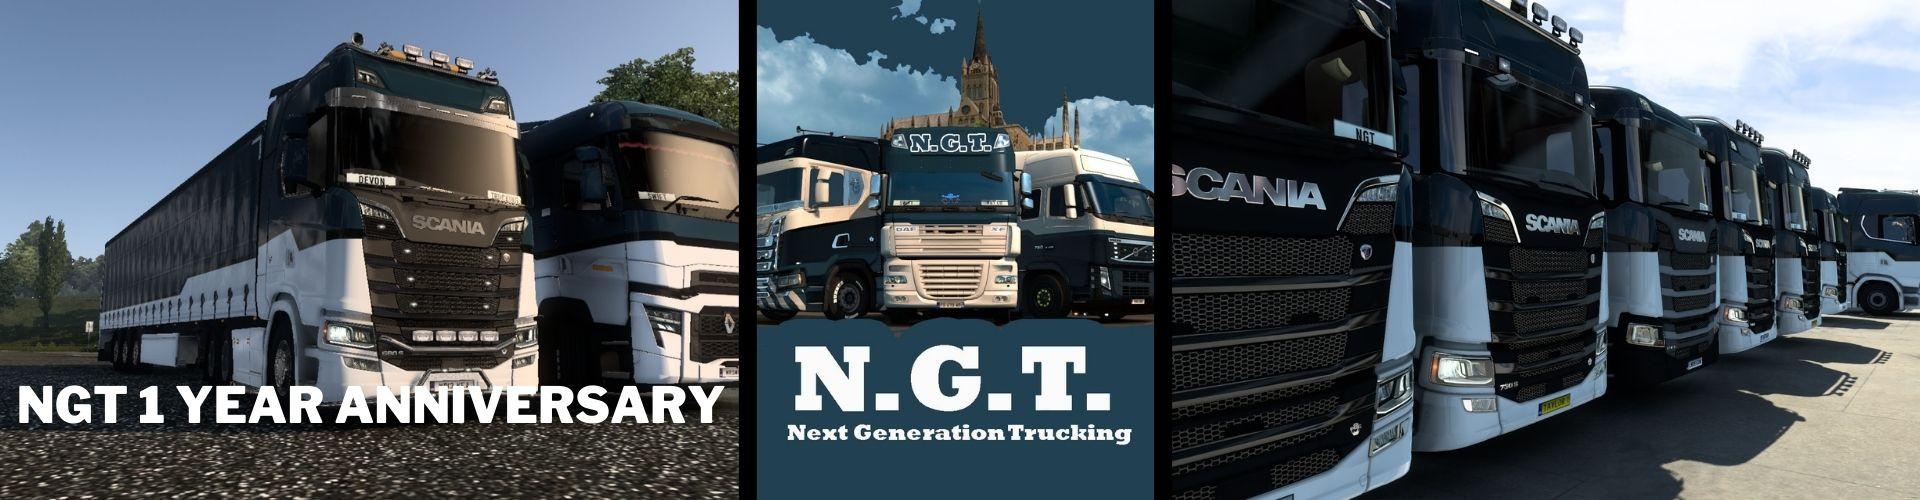 NGT 1 Year Anniversary